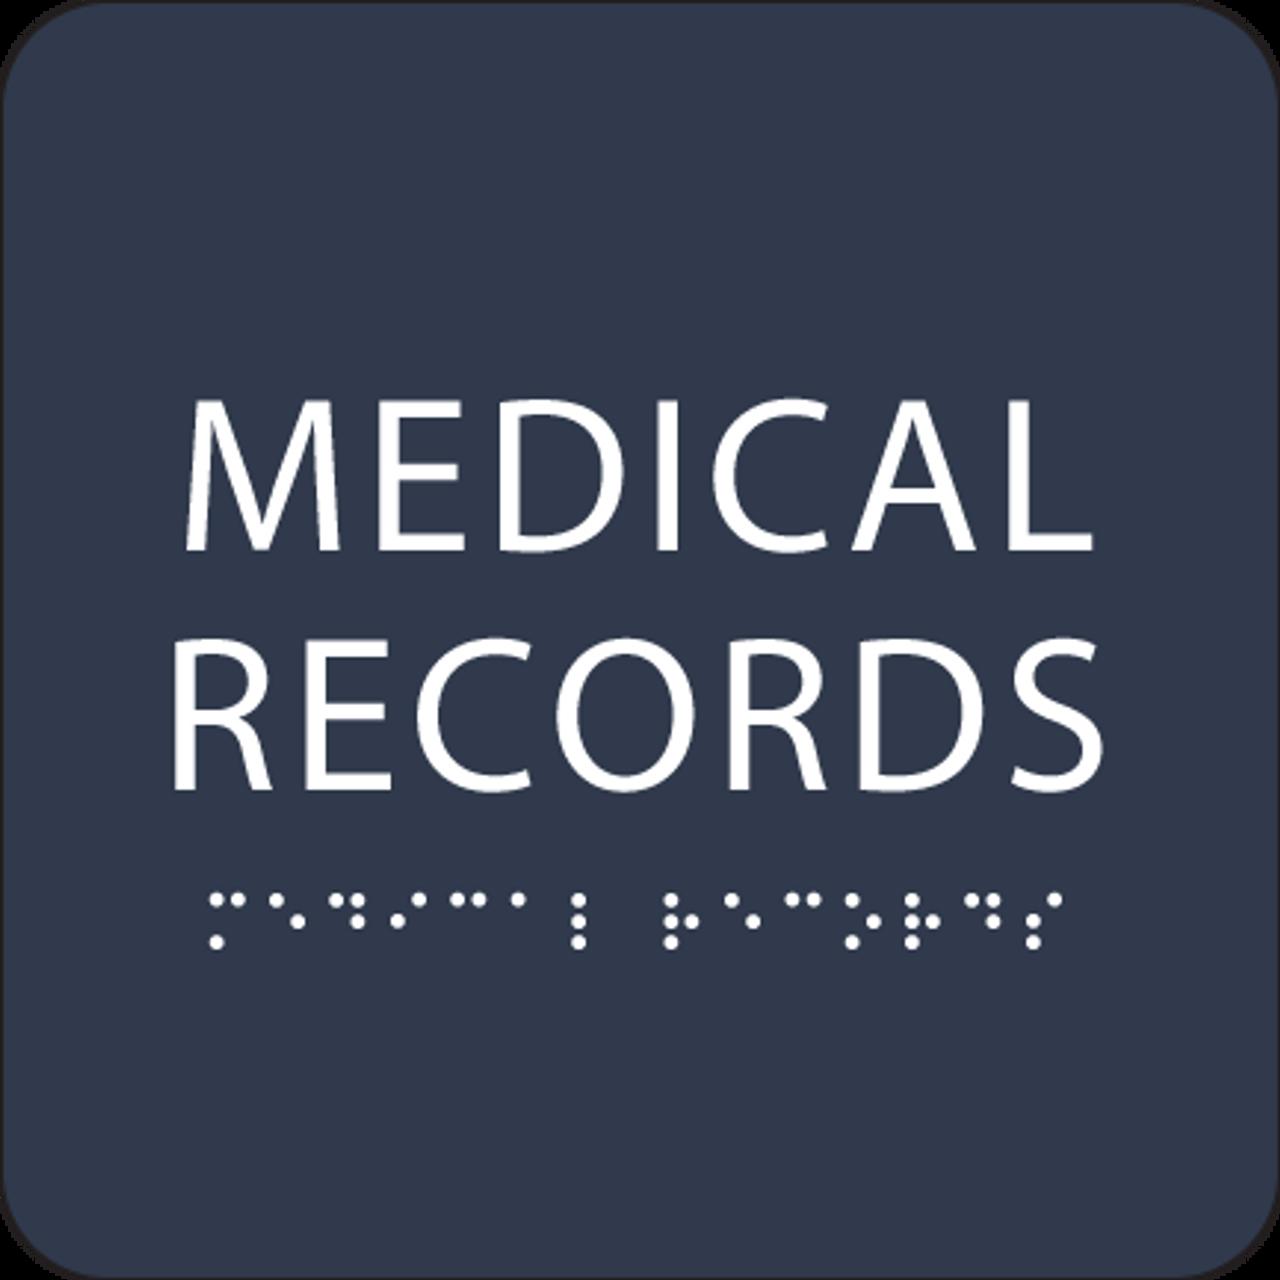 Navy Medical Records ADA Sign